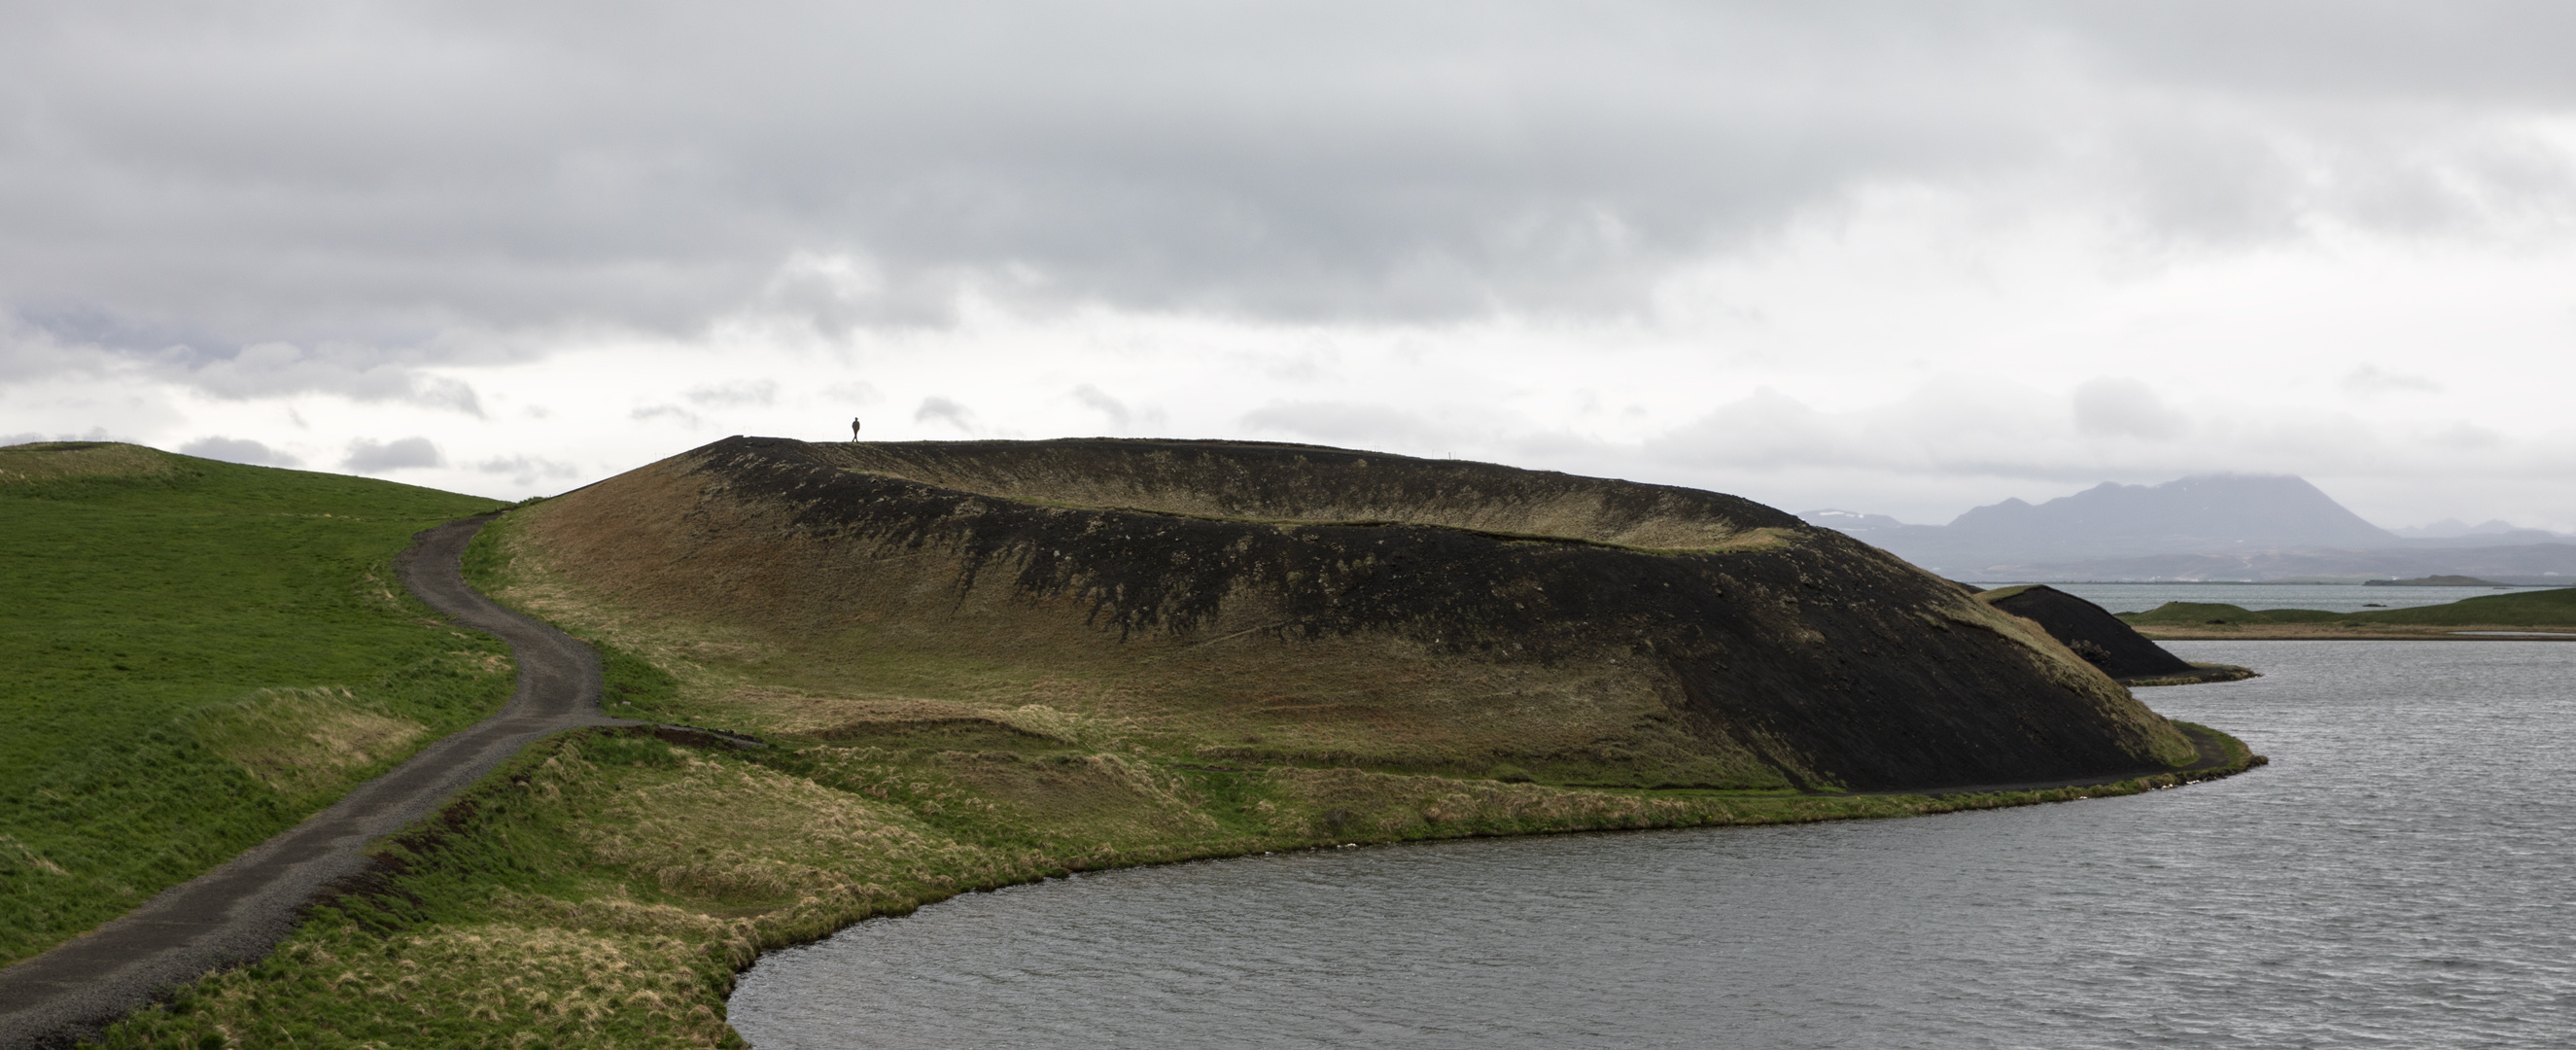 Dem Kraterrand entlang